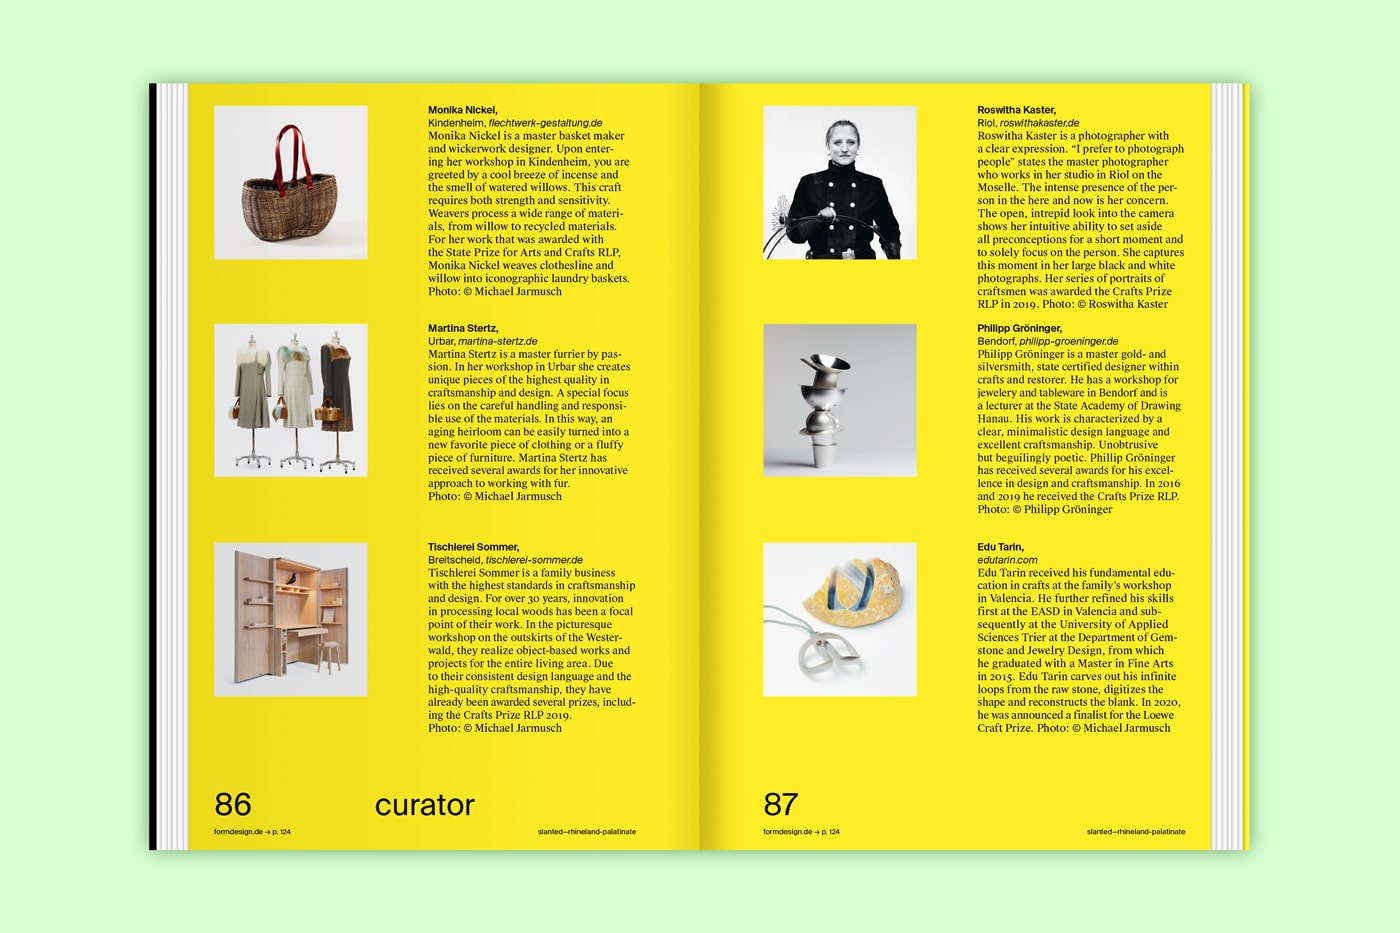 Slanted-Special-Issue-Rhineland-Palatinate_19.jpg